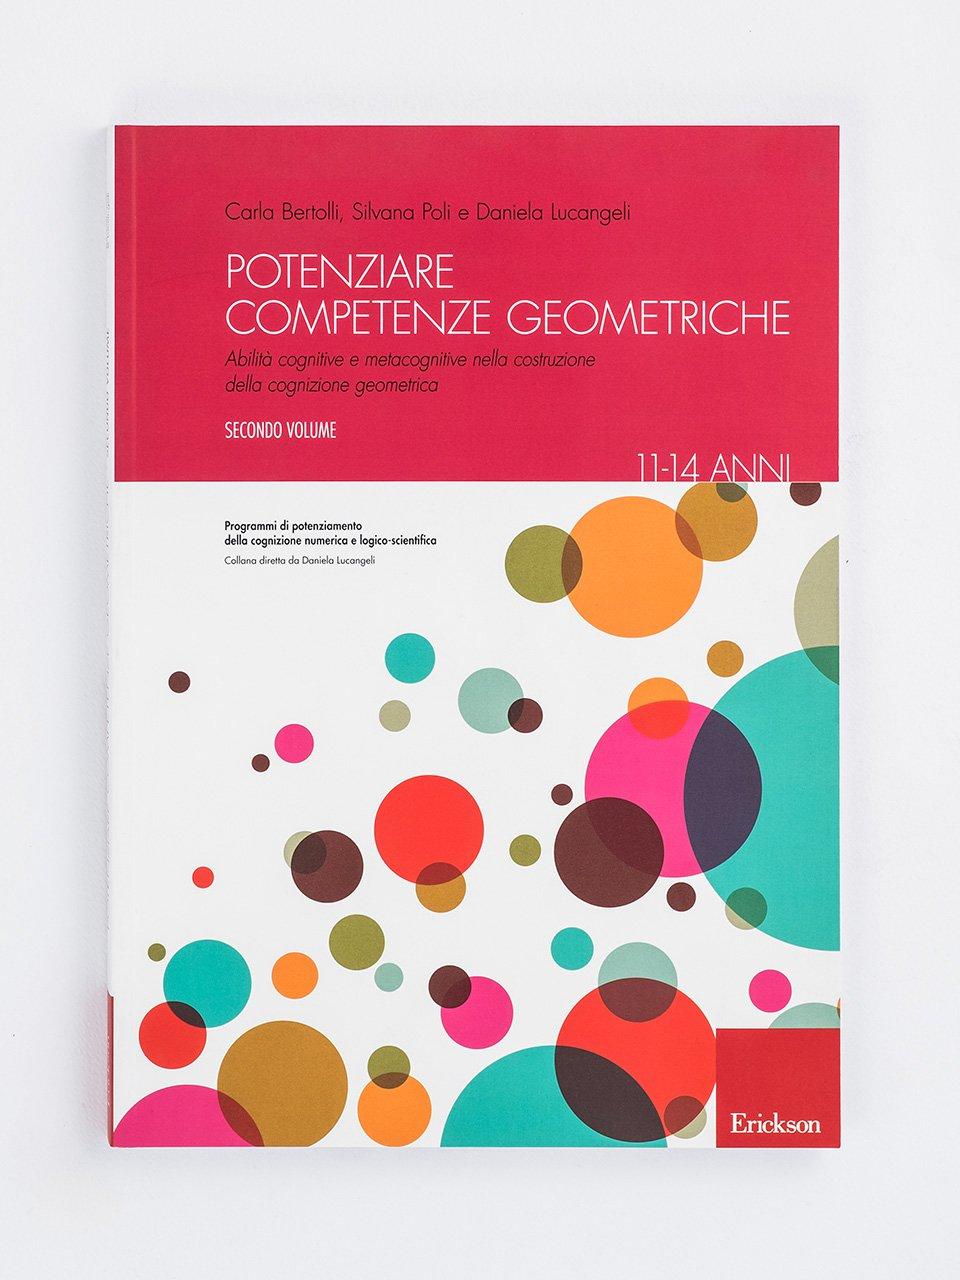 Potenziare competenze geometriche - Volume 2 - Daniela Lucangeli - Erickson